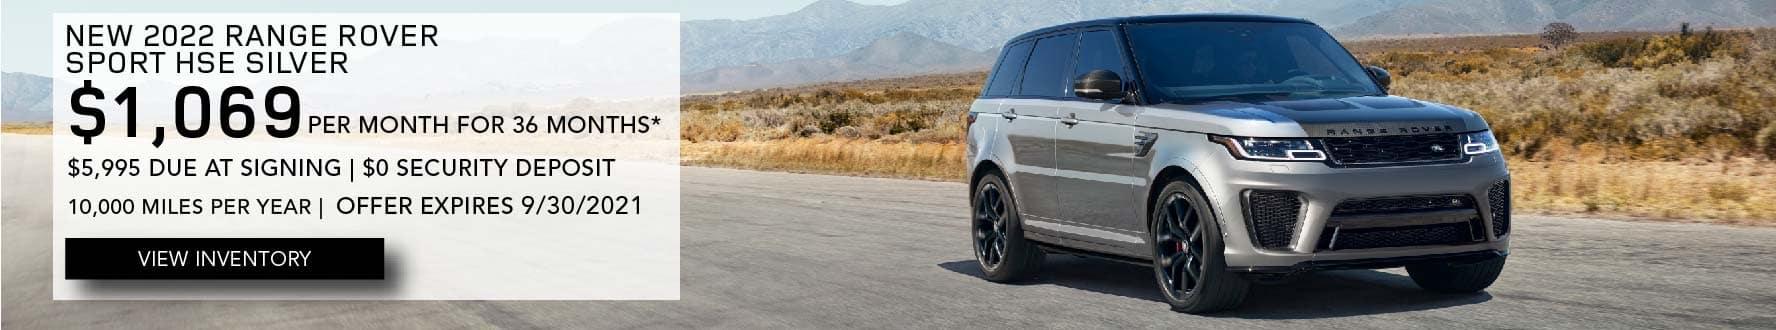 LR Westside_New 2022 Range Rover Sport